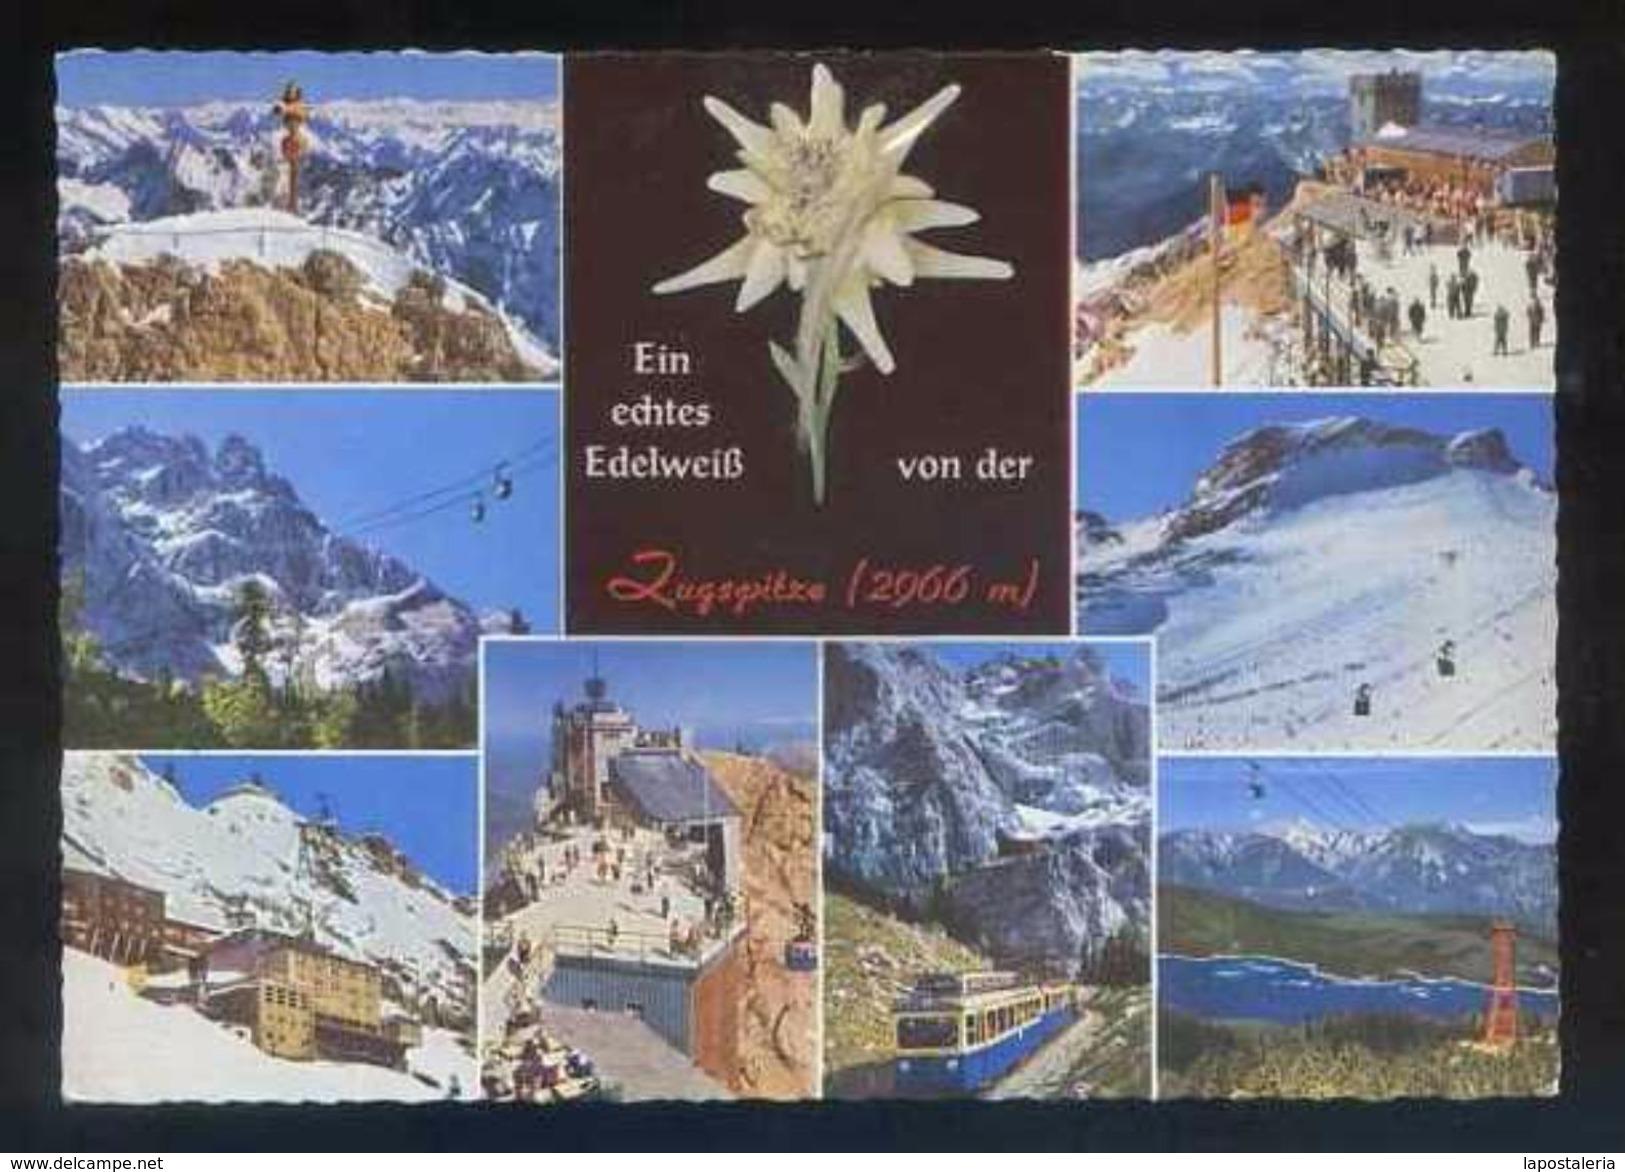 Postal Con Flor Edelweiss. *Zugspitze 2966 M.* Ed. Huber-Postkarte Nº 8503. Nueva. - Sin Clasificación